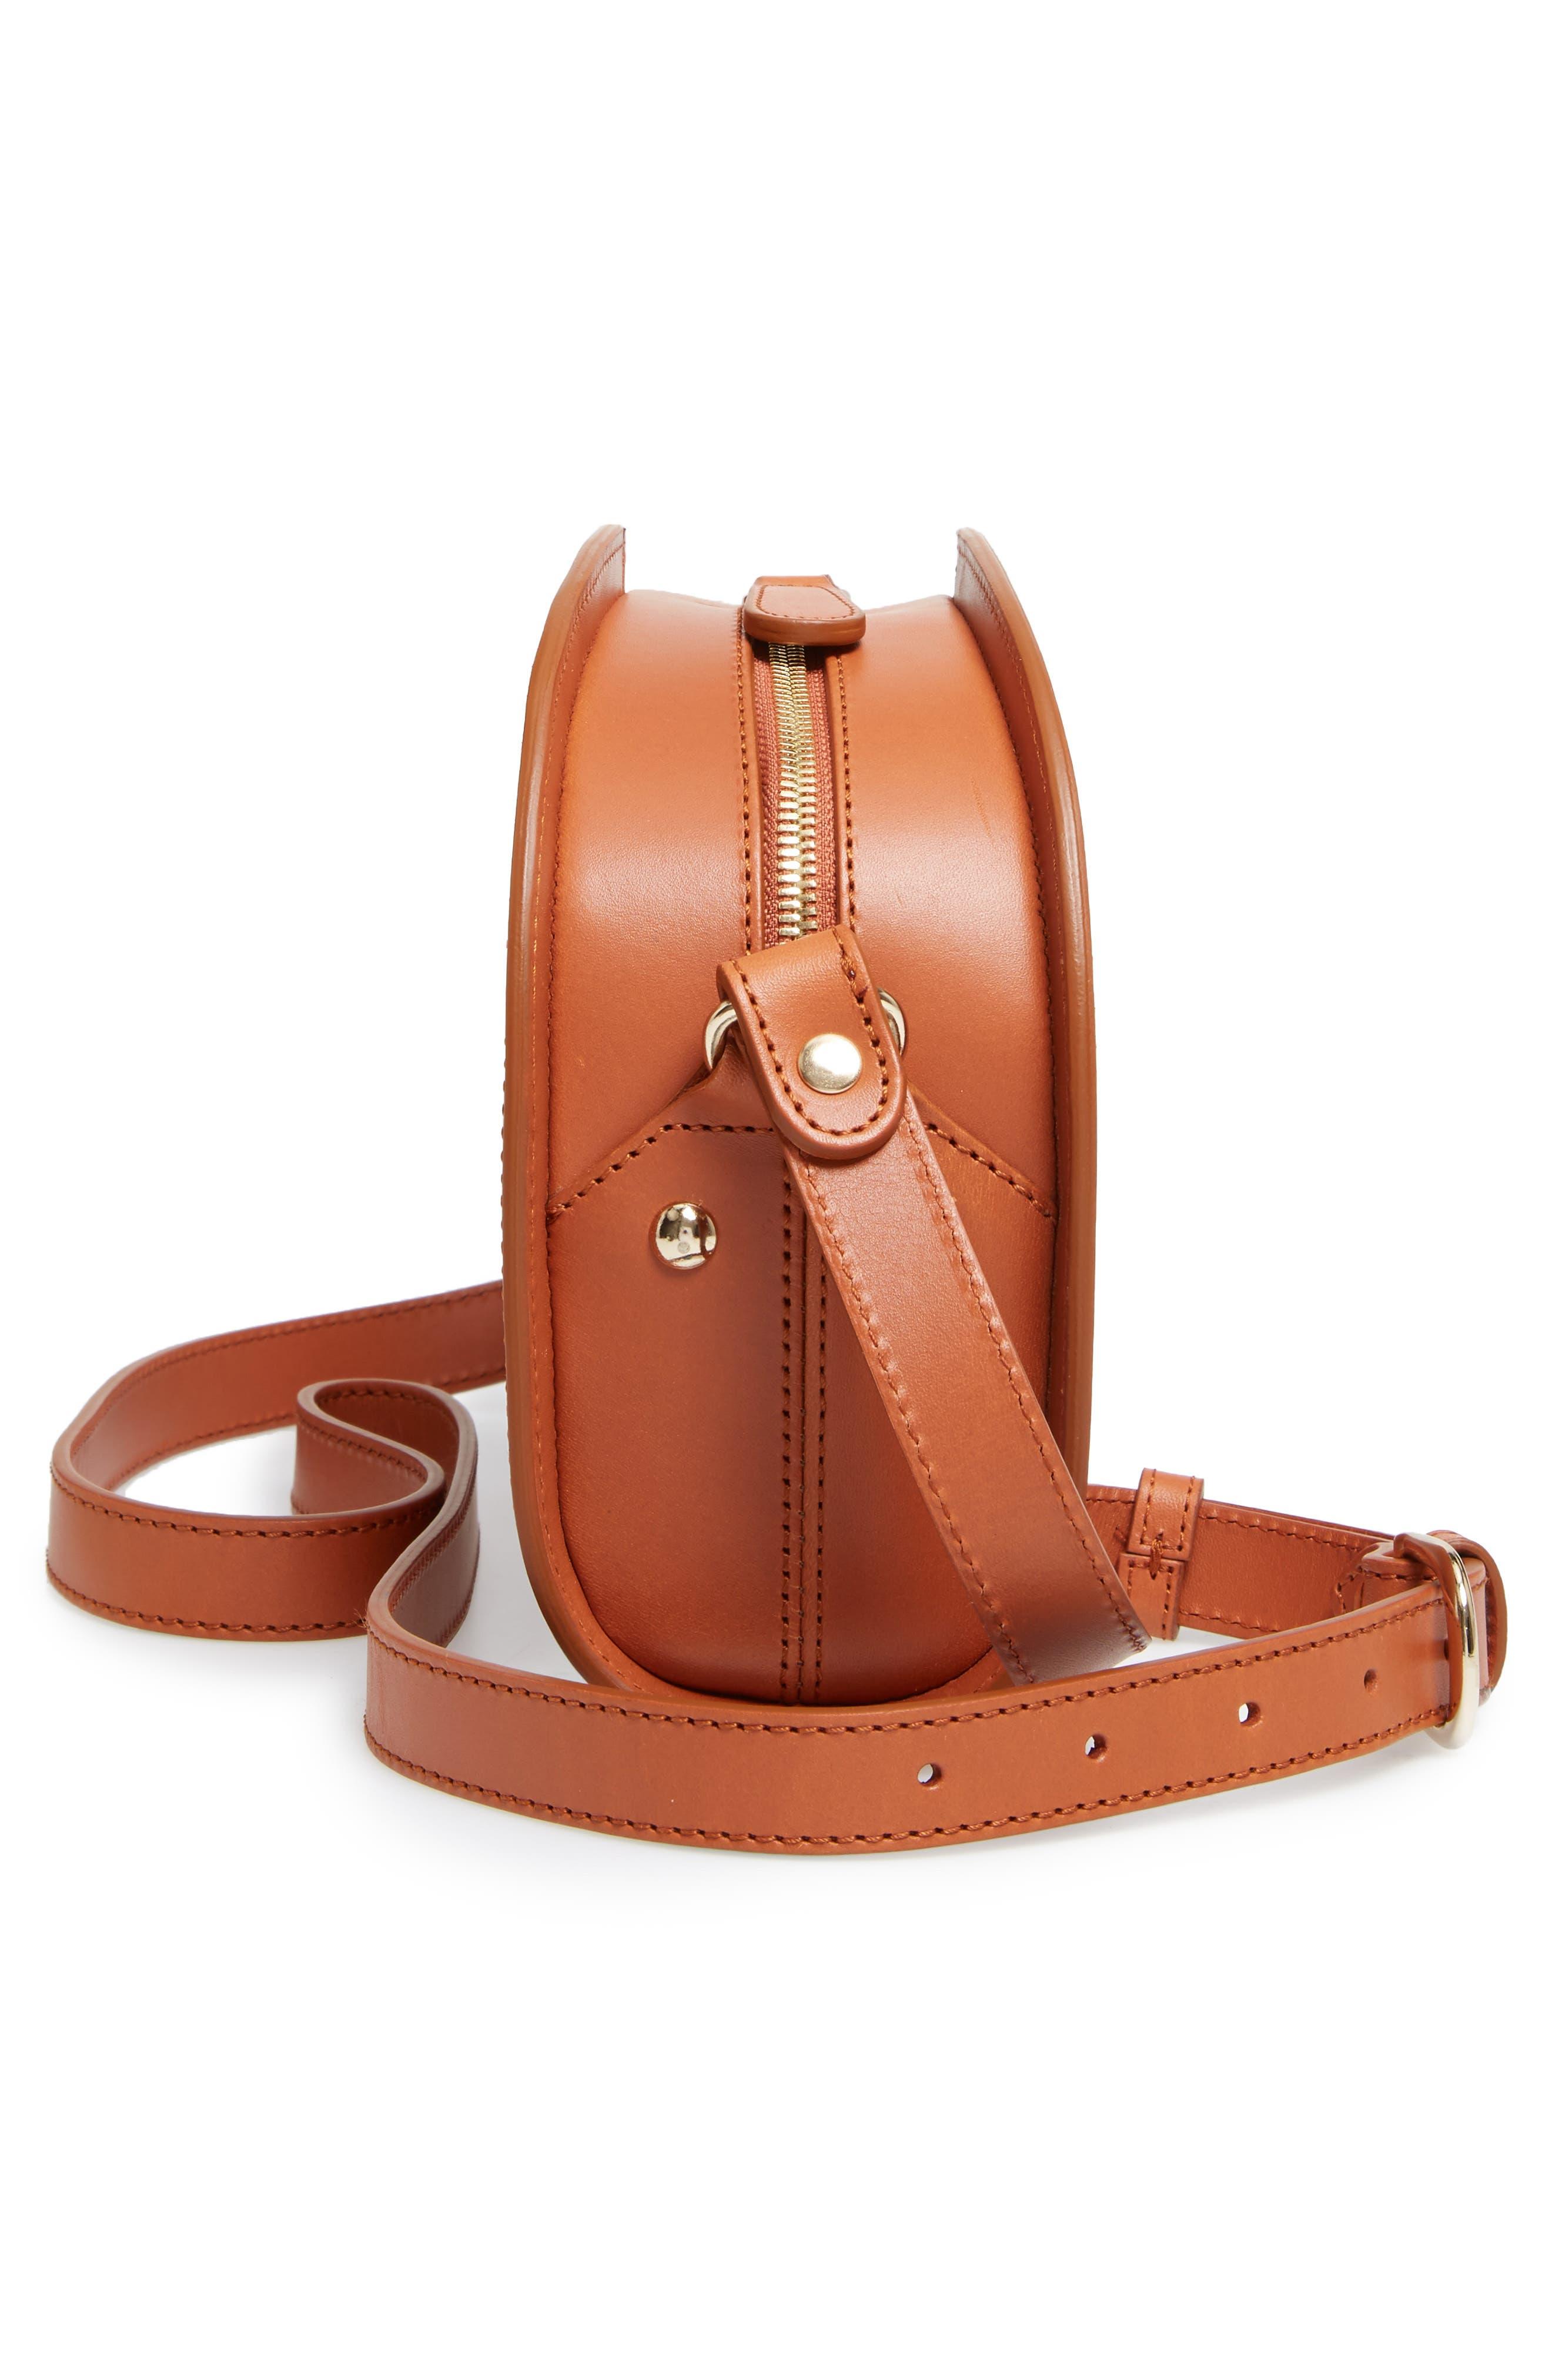 Sac Demi Lune Leather Crossbody Bag,                             Alternate thumbnail 3, color,                             Caramel